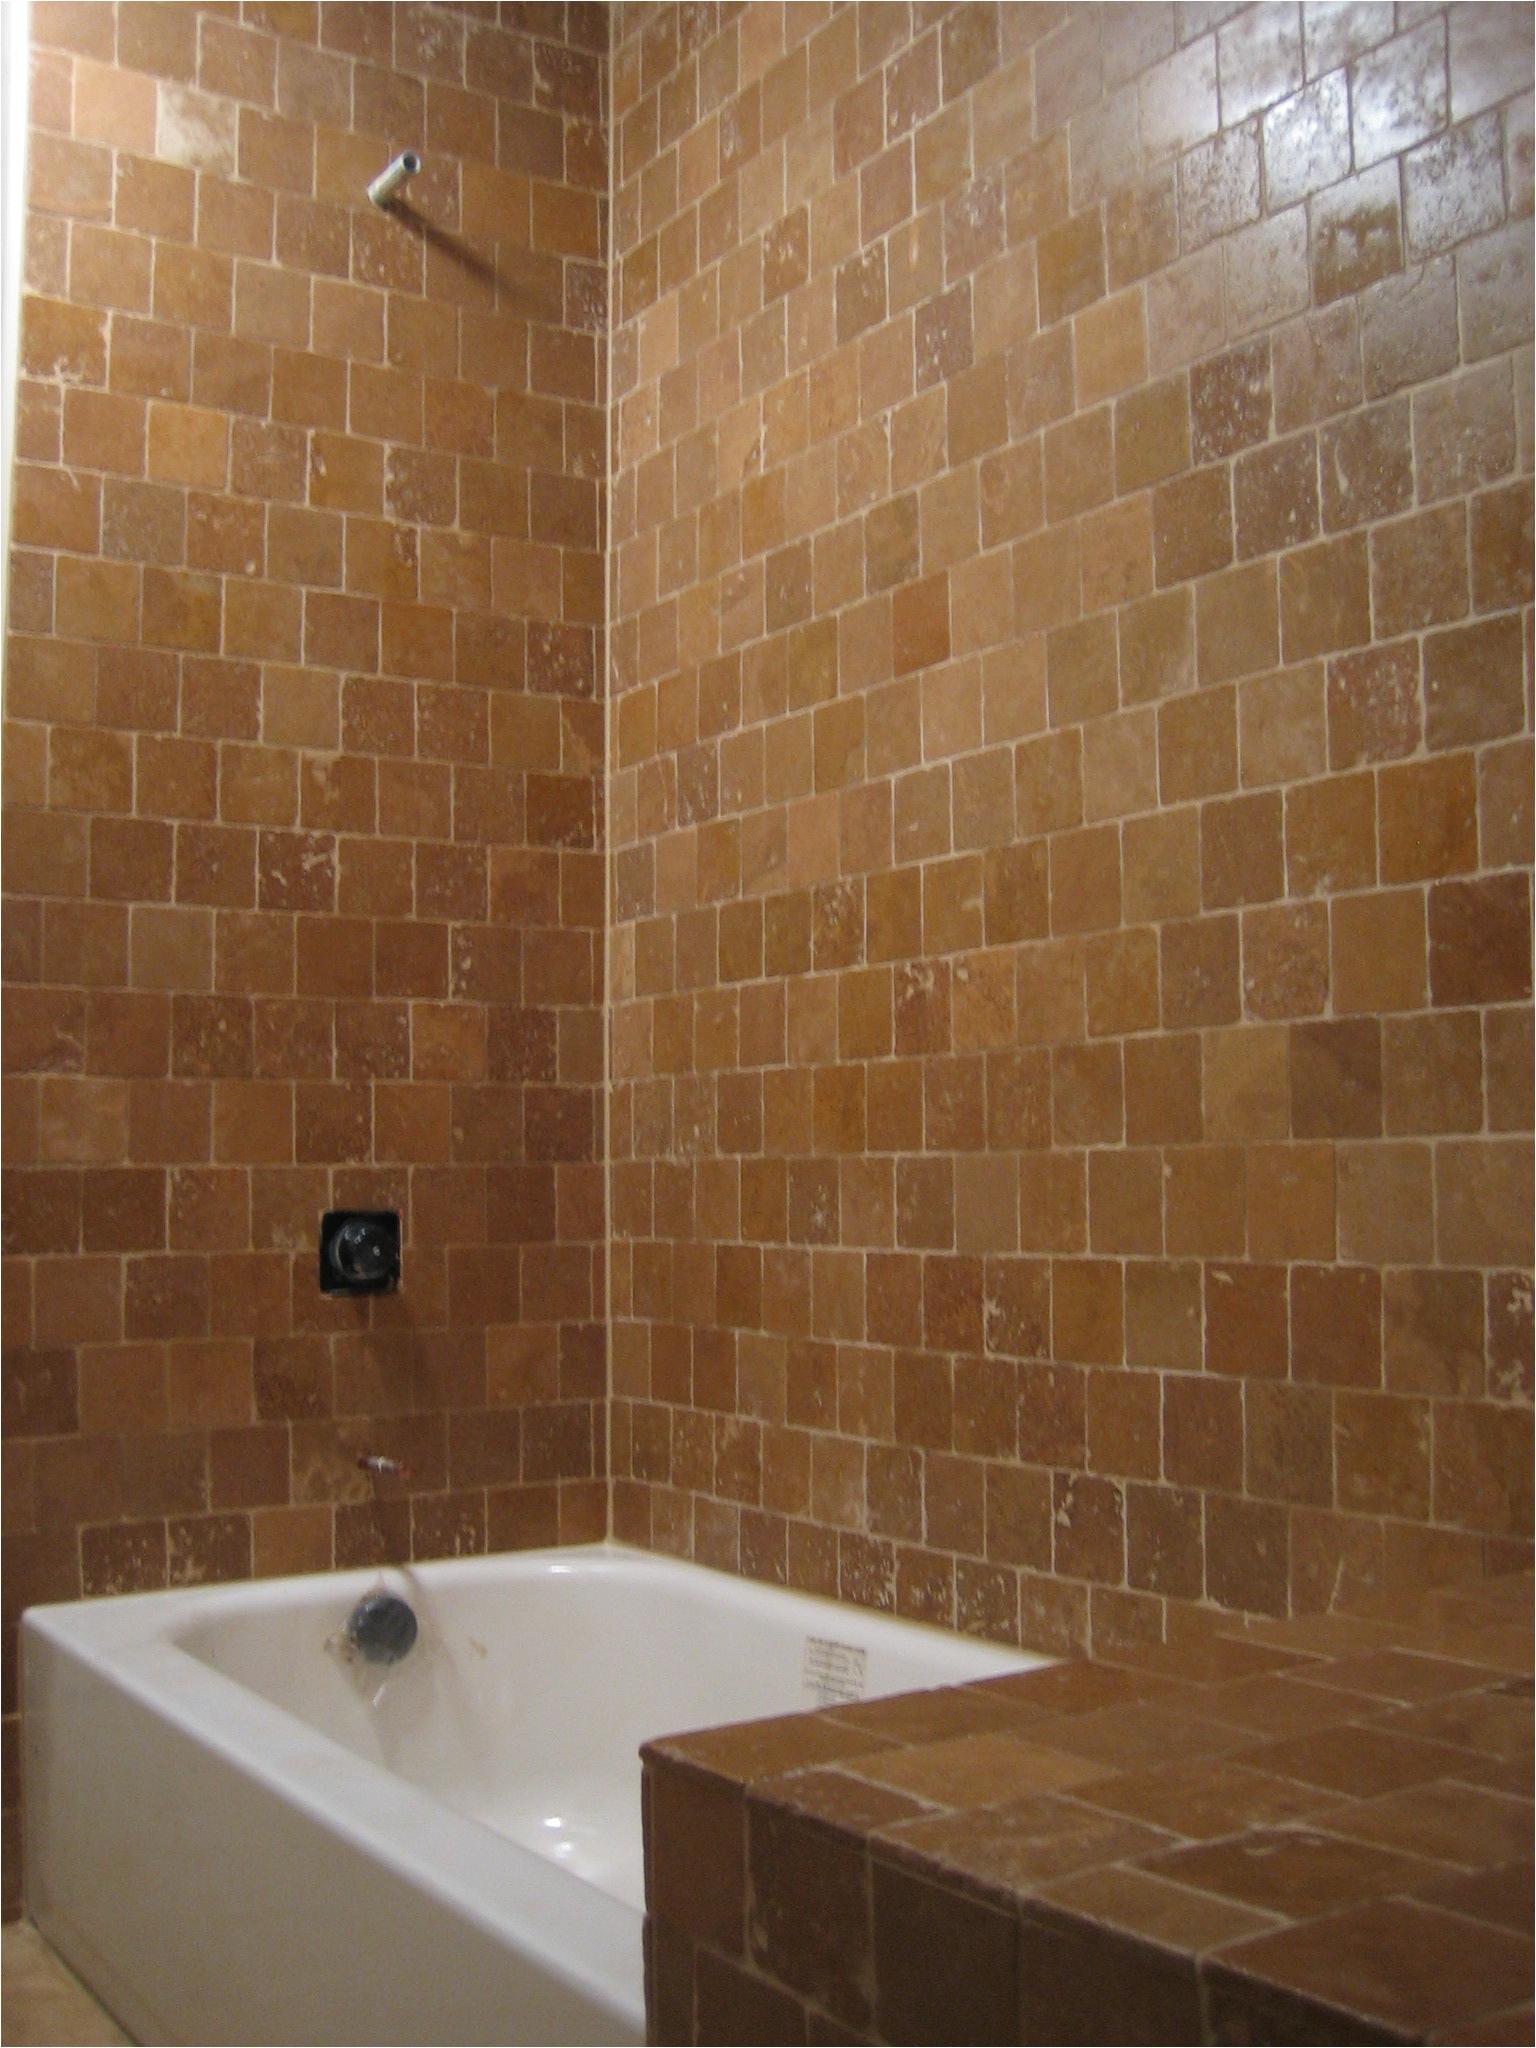 Menards Jacuzzi Bathtubs Bathroom Surround Your Bath In Style with Great Bathtubs